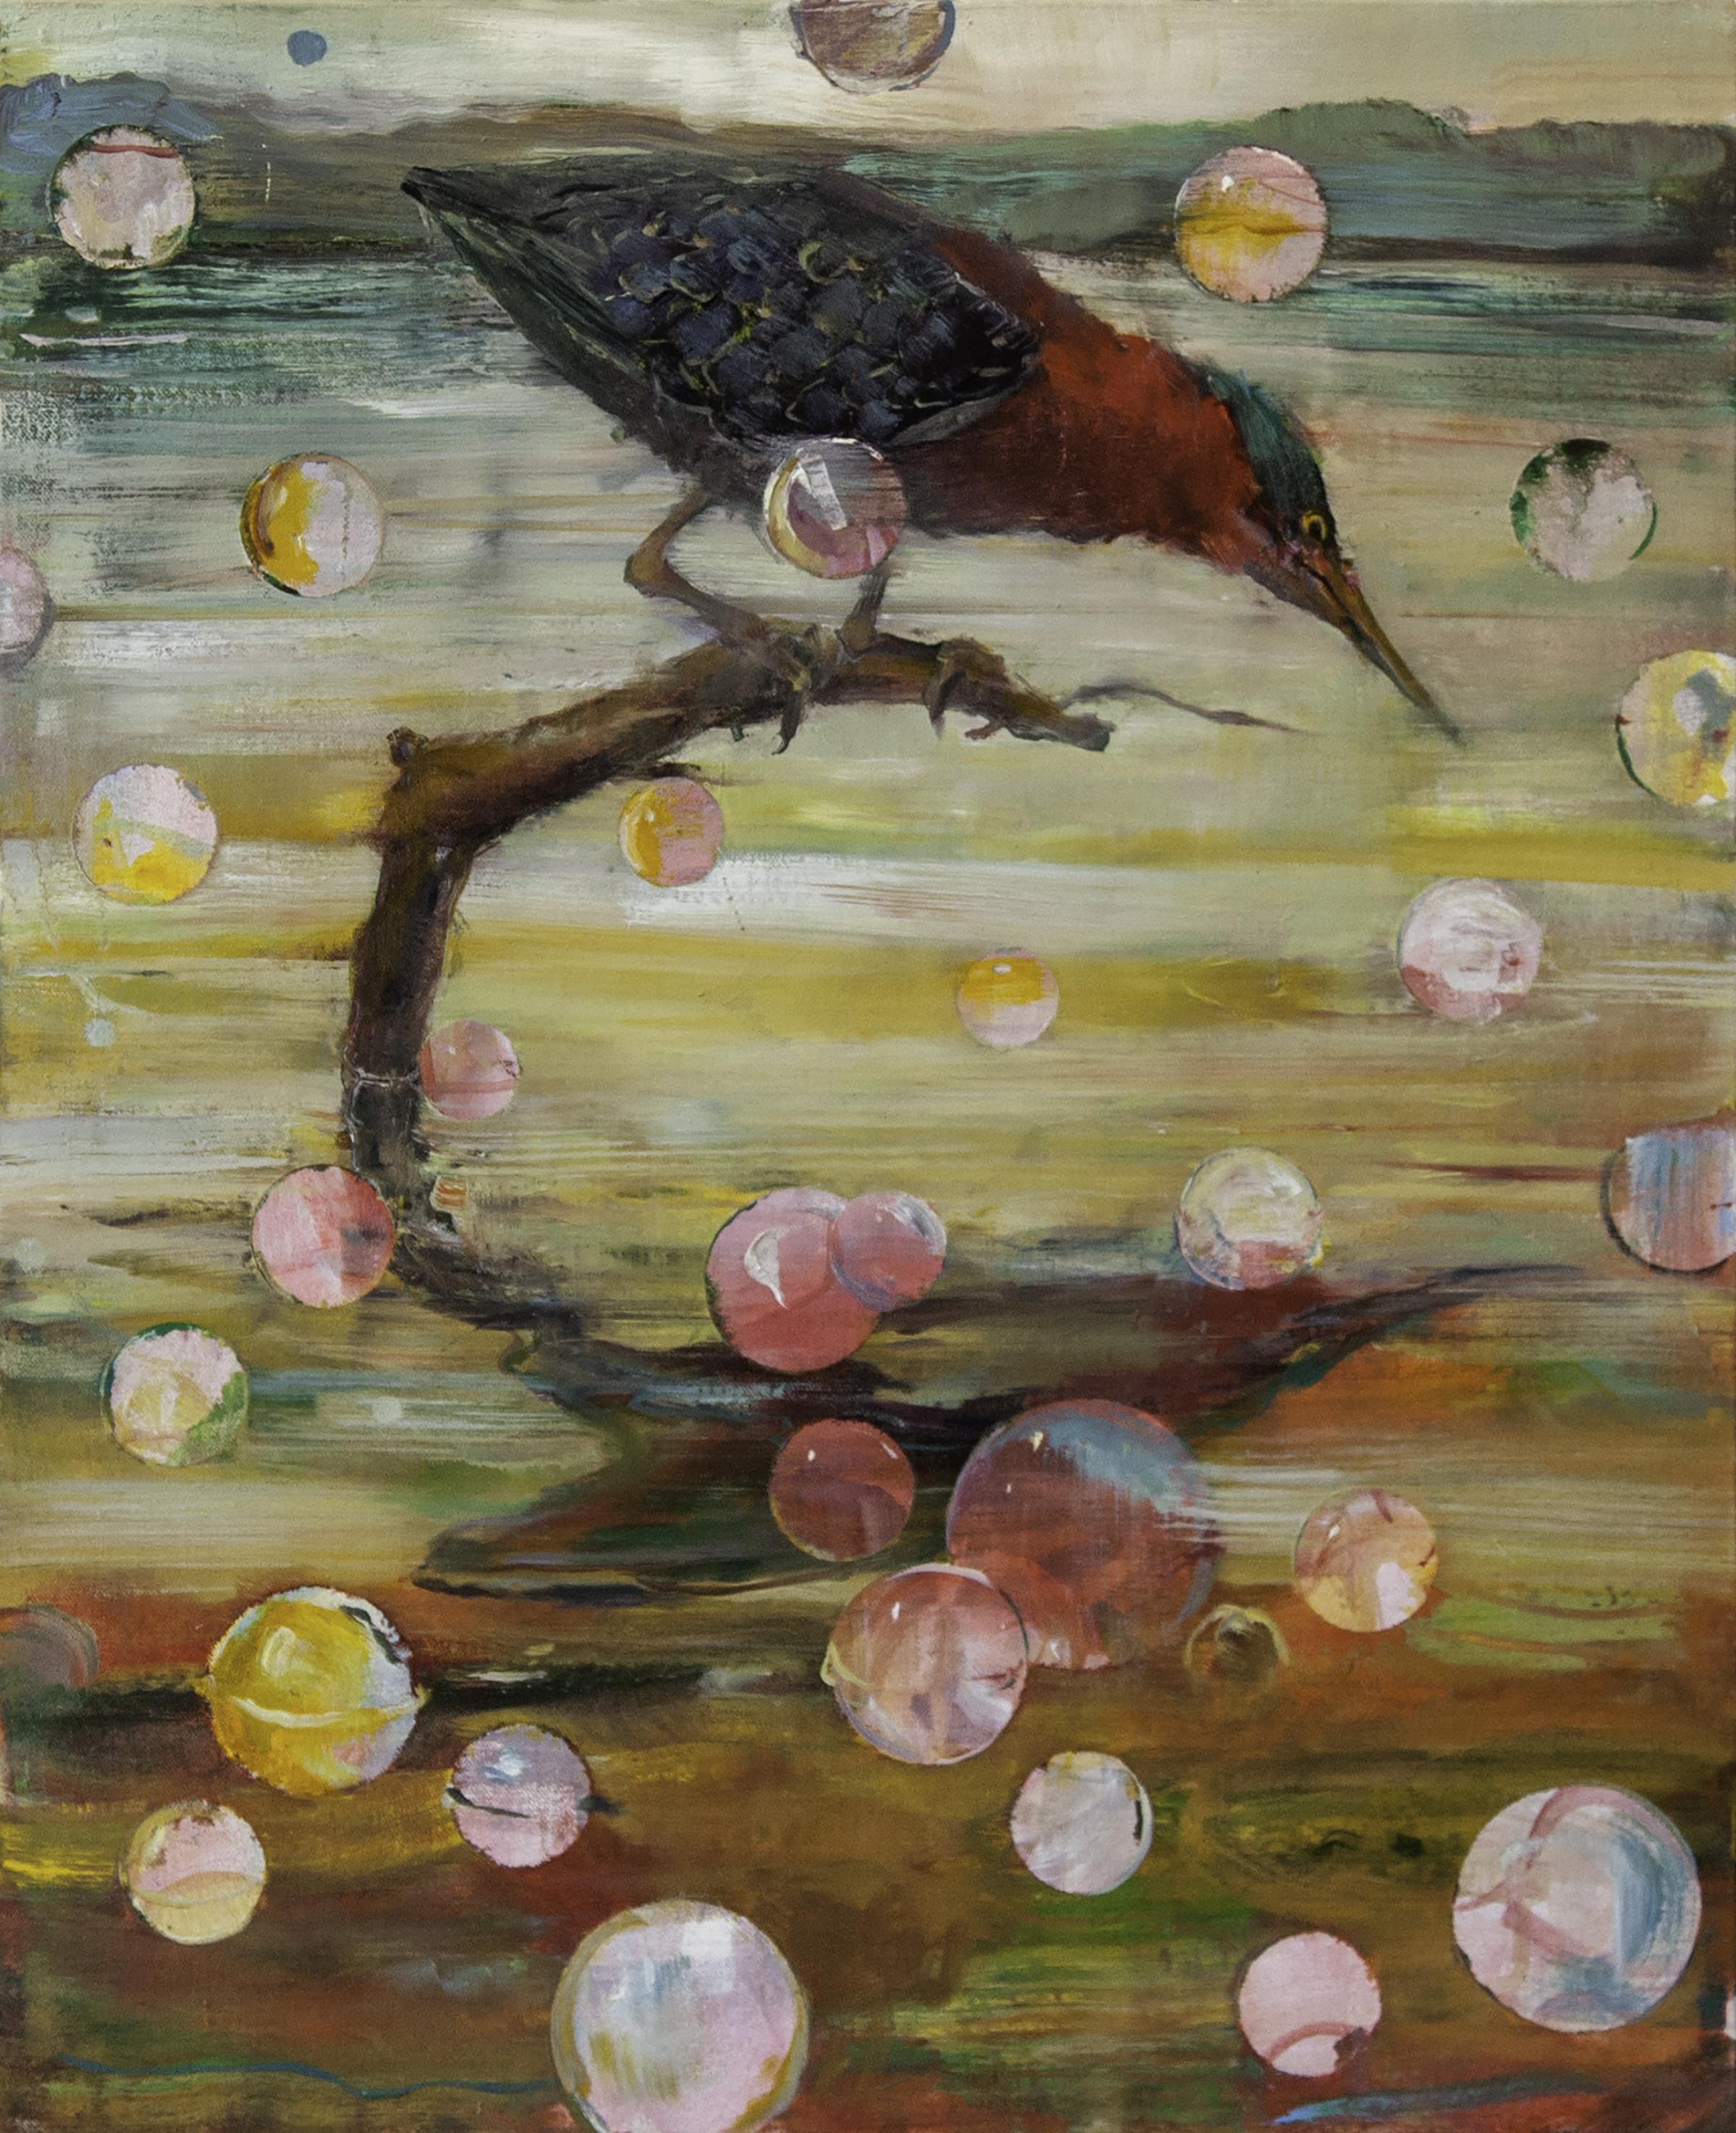 Evening Heron